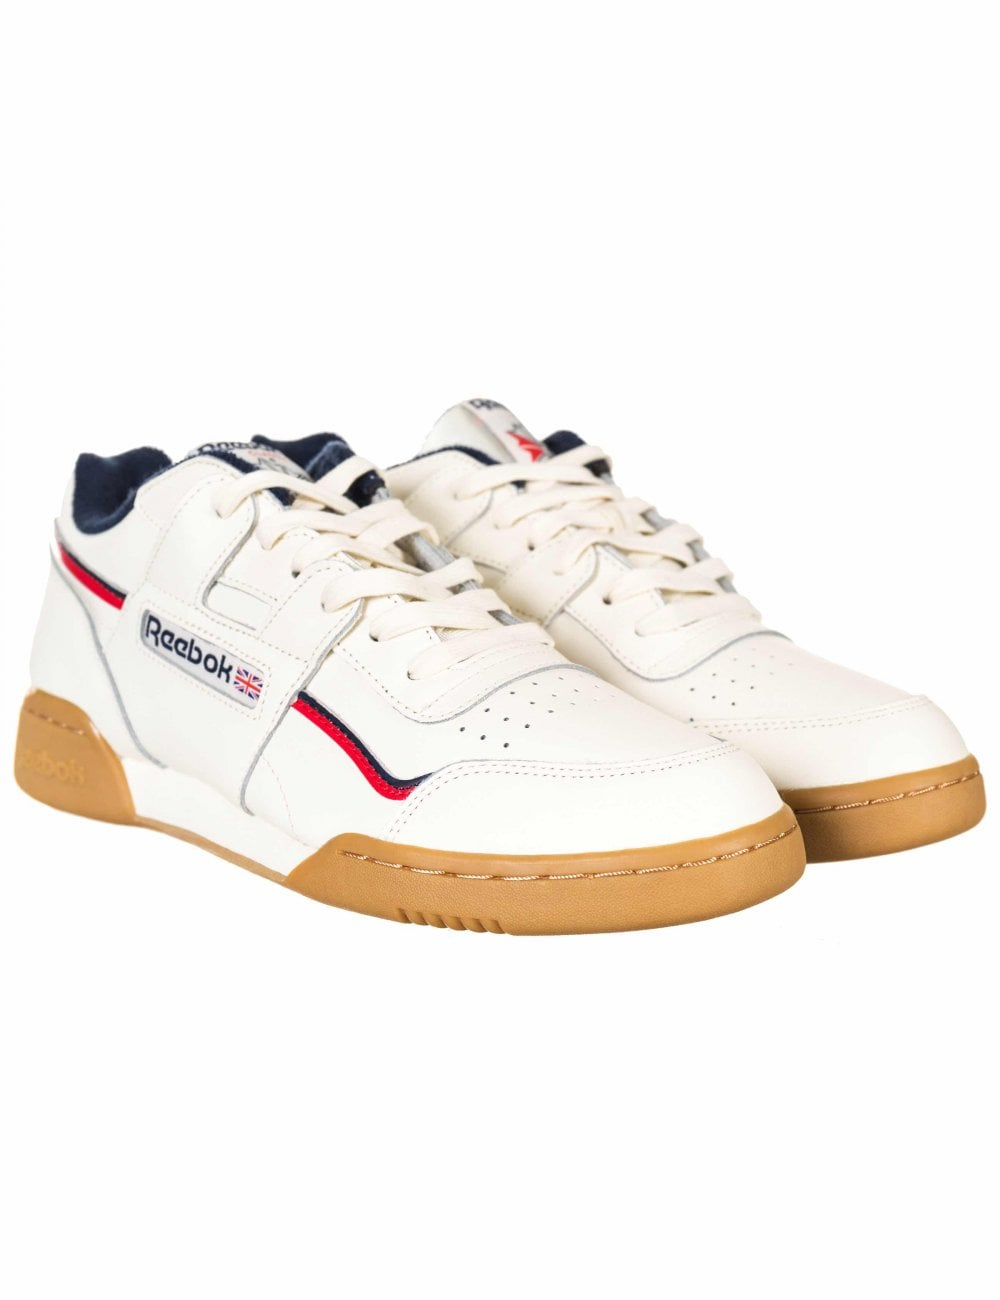 Classics Schuhe | Reebok Workout Plus Classics Schuhe